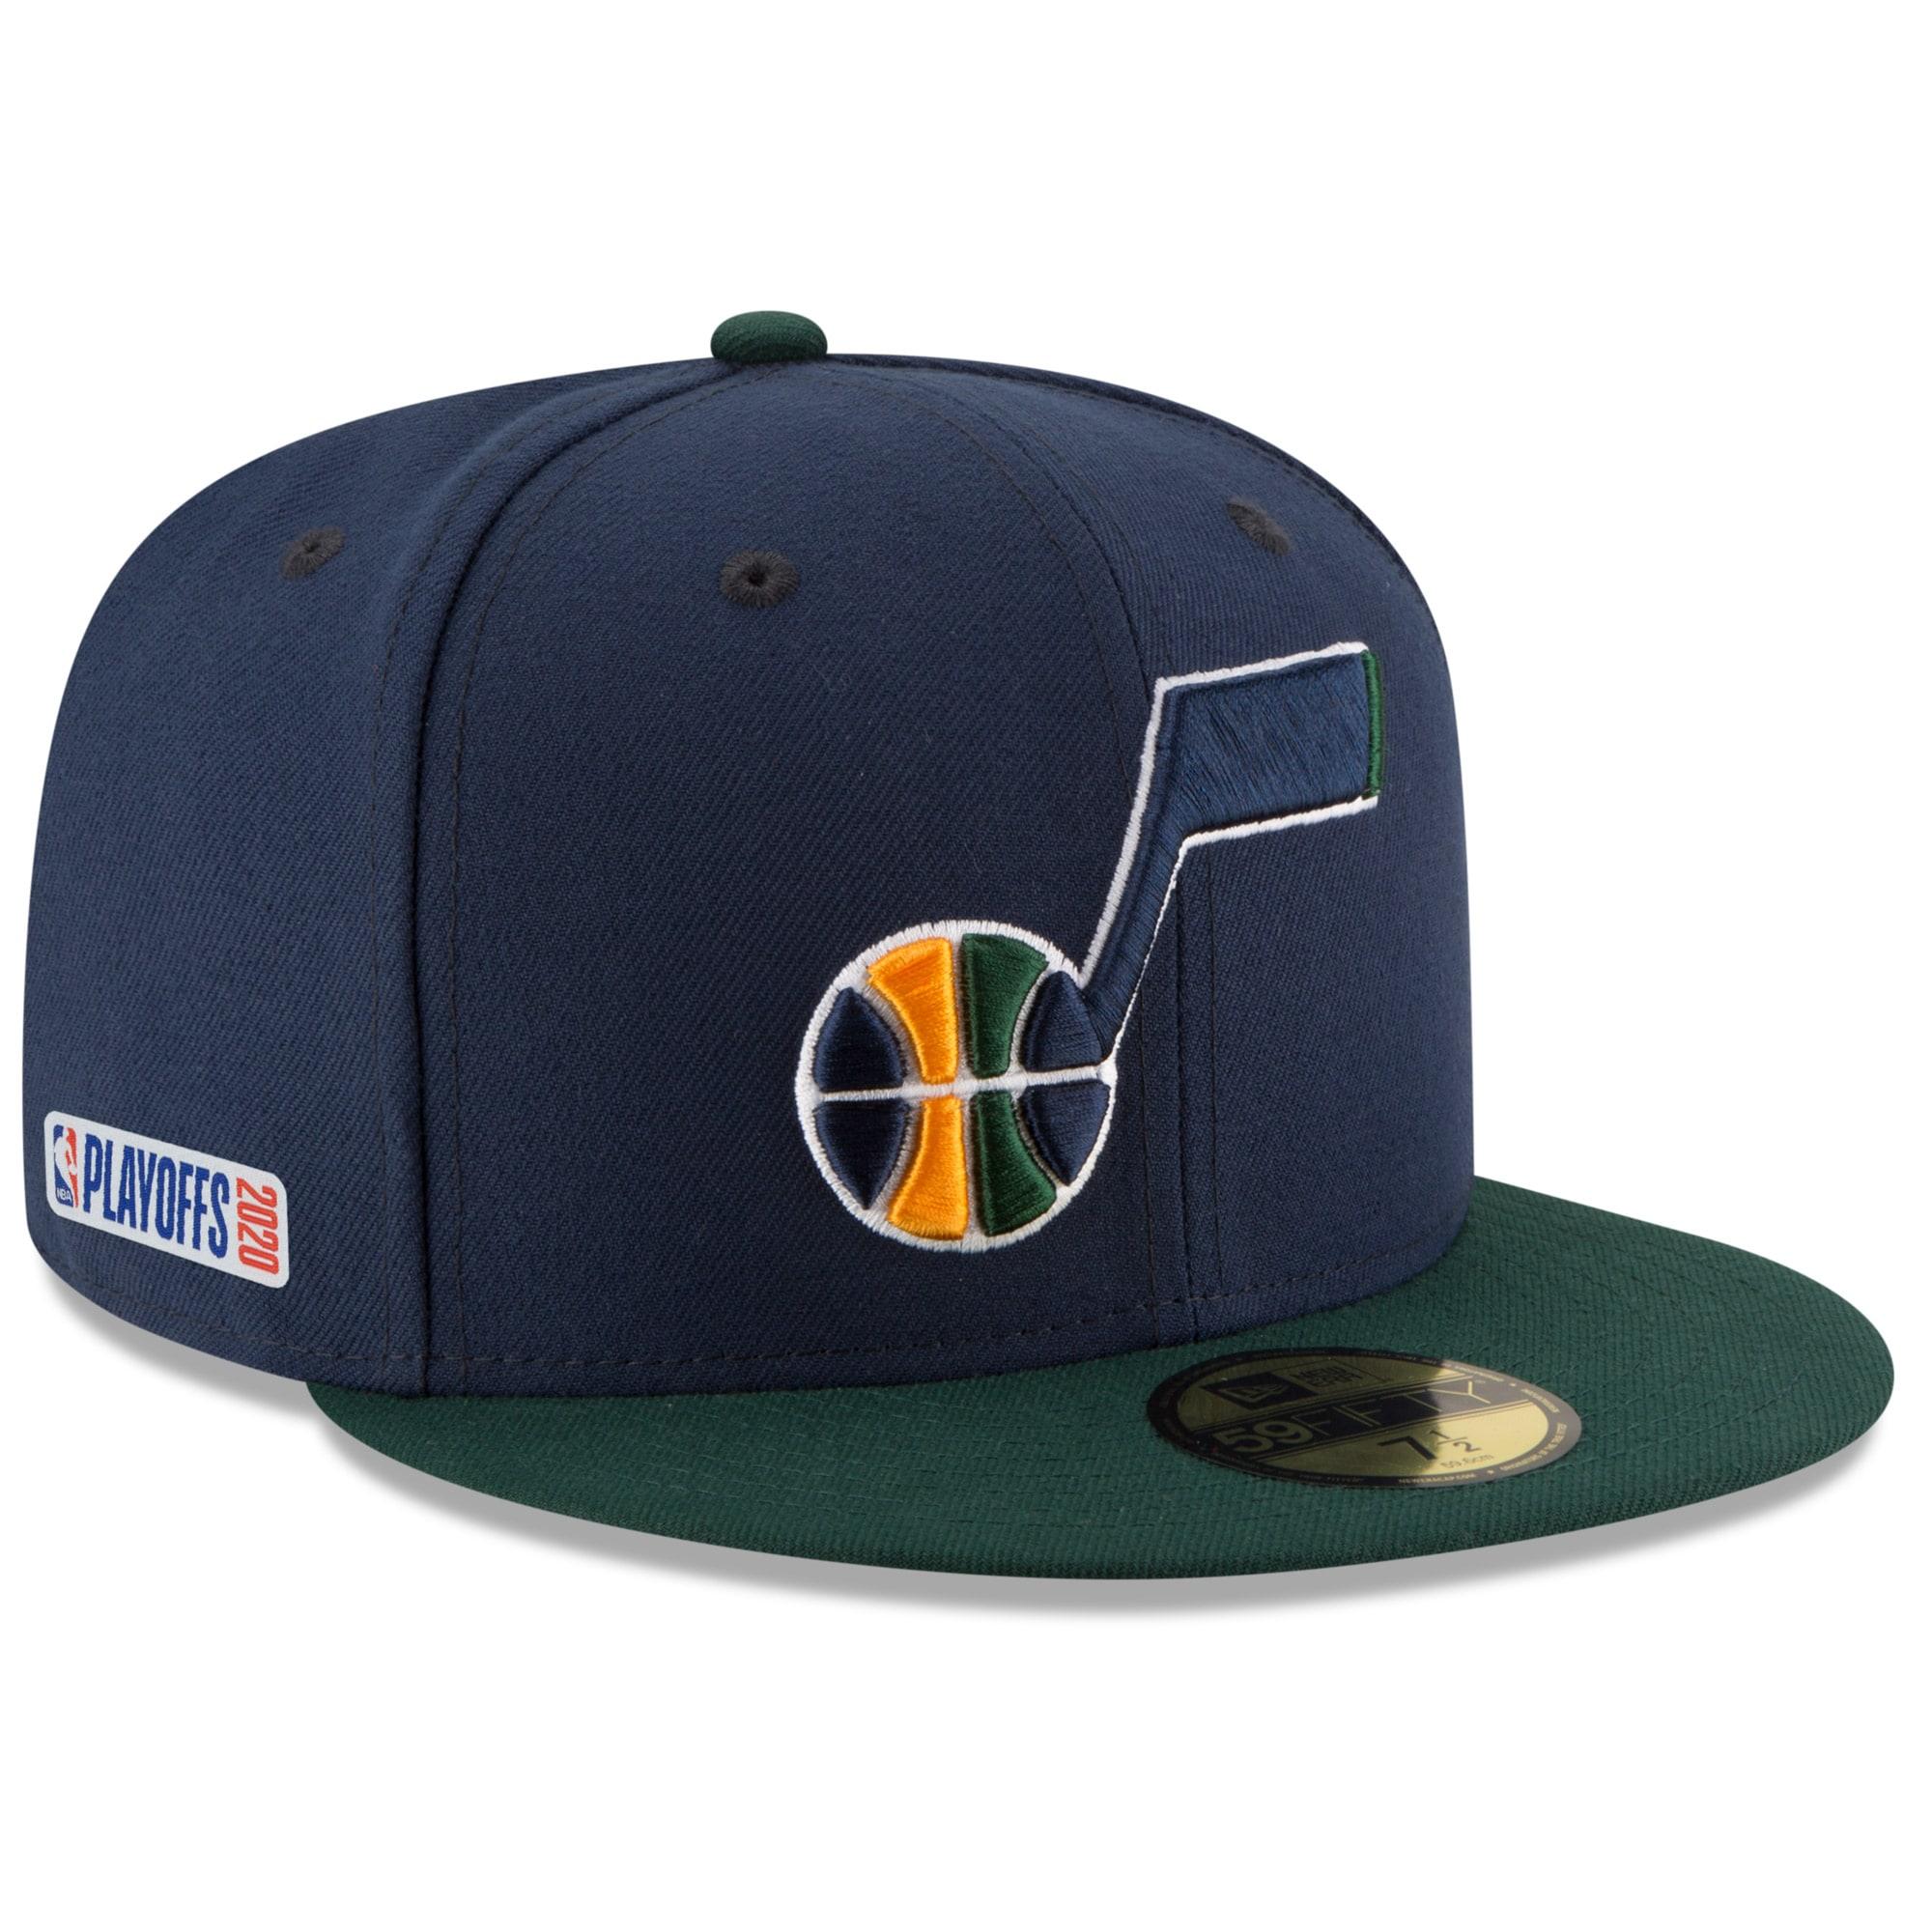 Utah Jazz New Era 2020 NBA Playoffs Bound 2-Tone 59FIFTY Fitted Hat - Navy